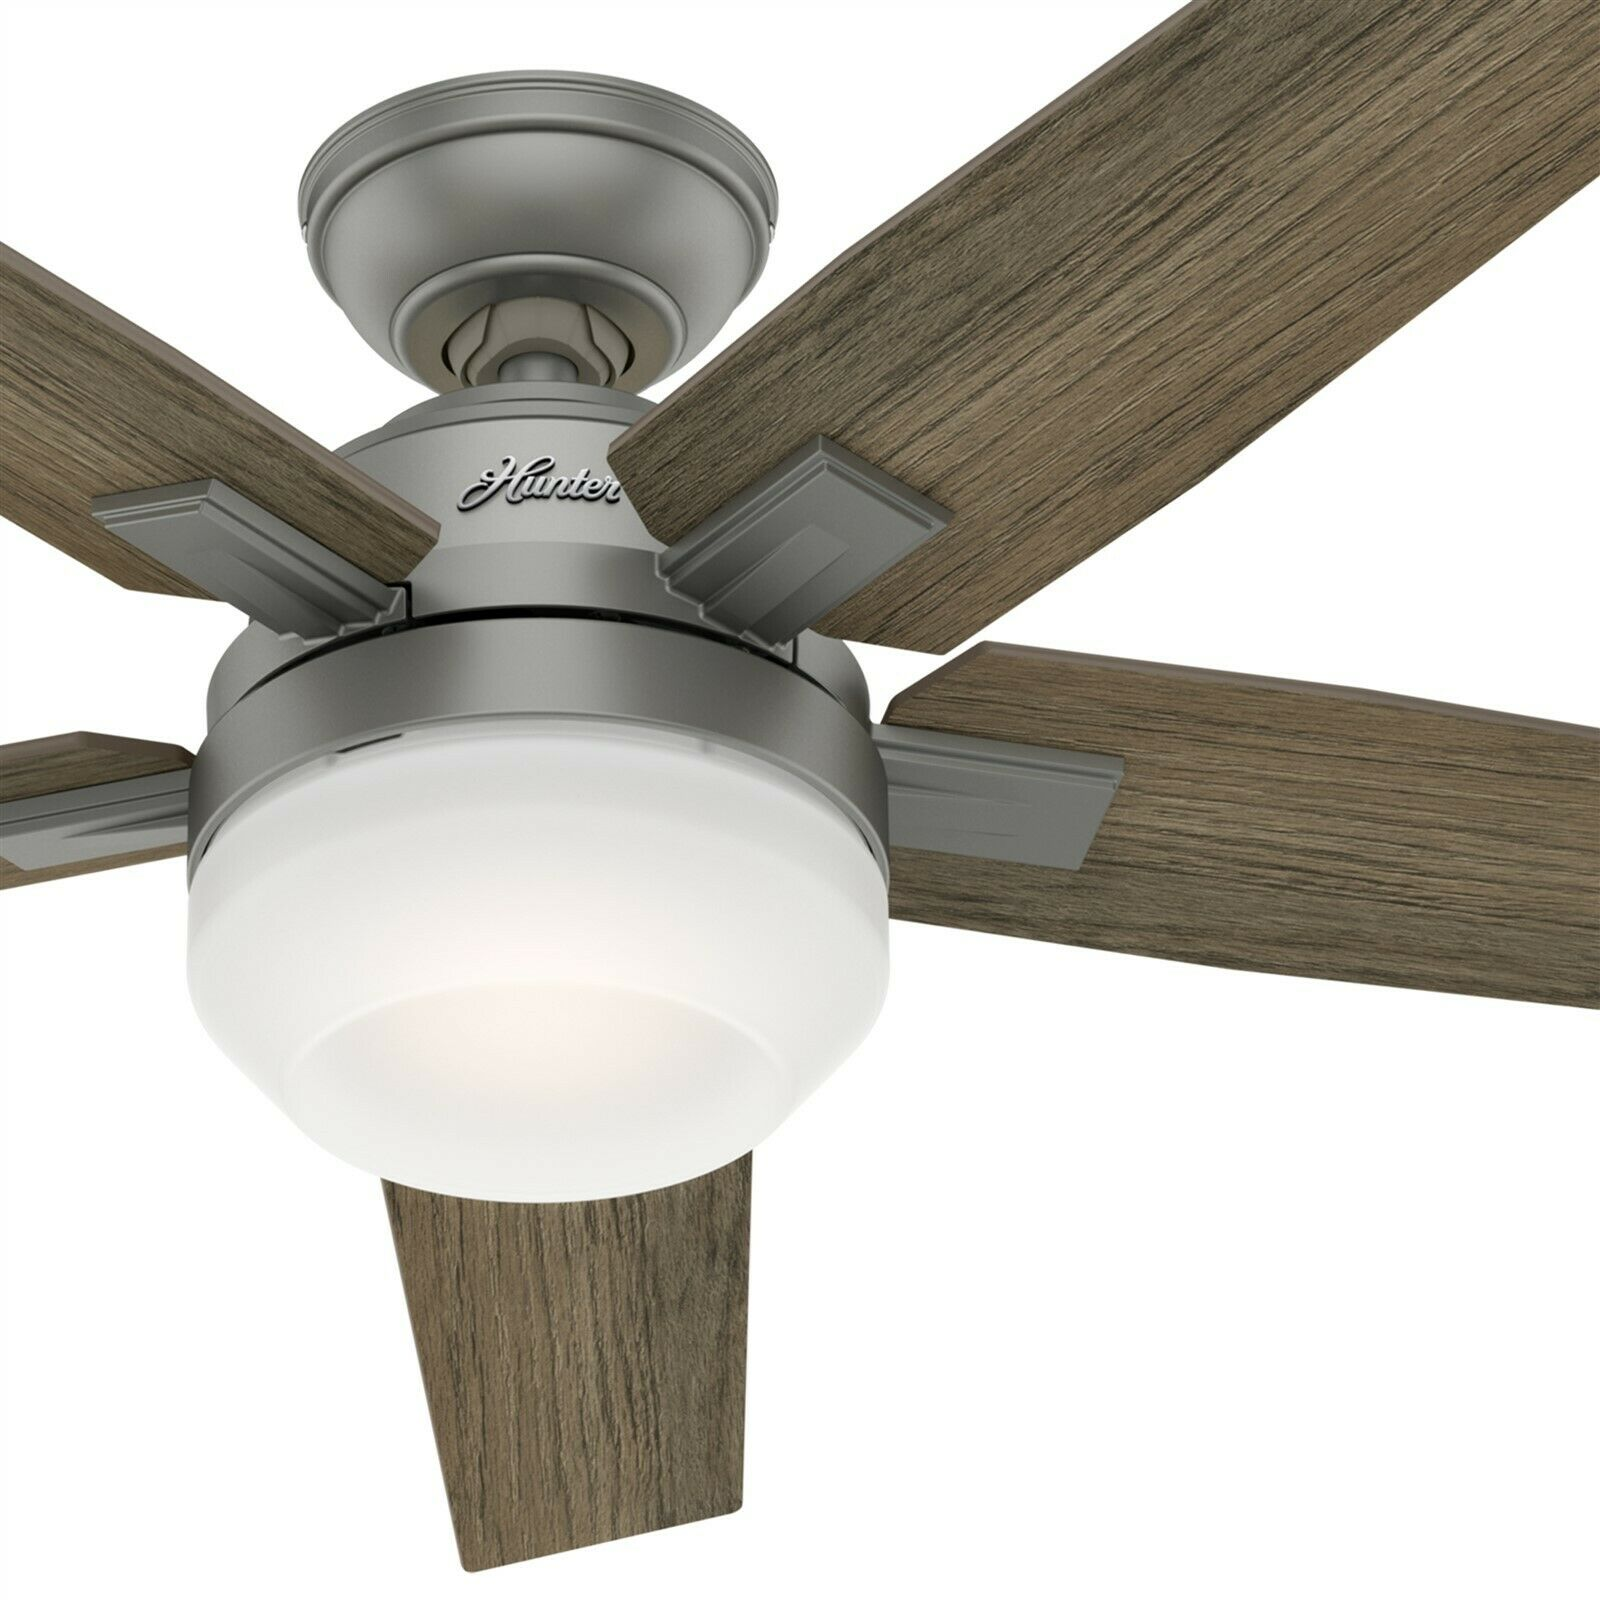 Hunter Fernwood Ceiling Fan With Light 70 Inch 55049 For Sale Online Ebay